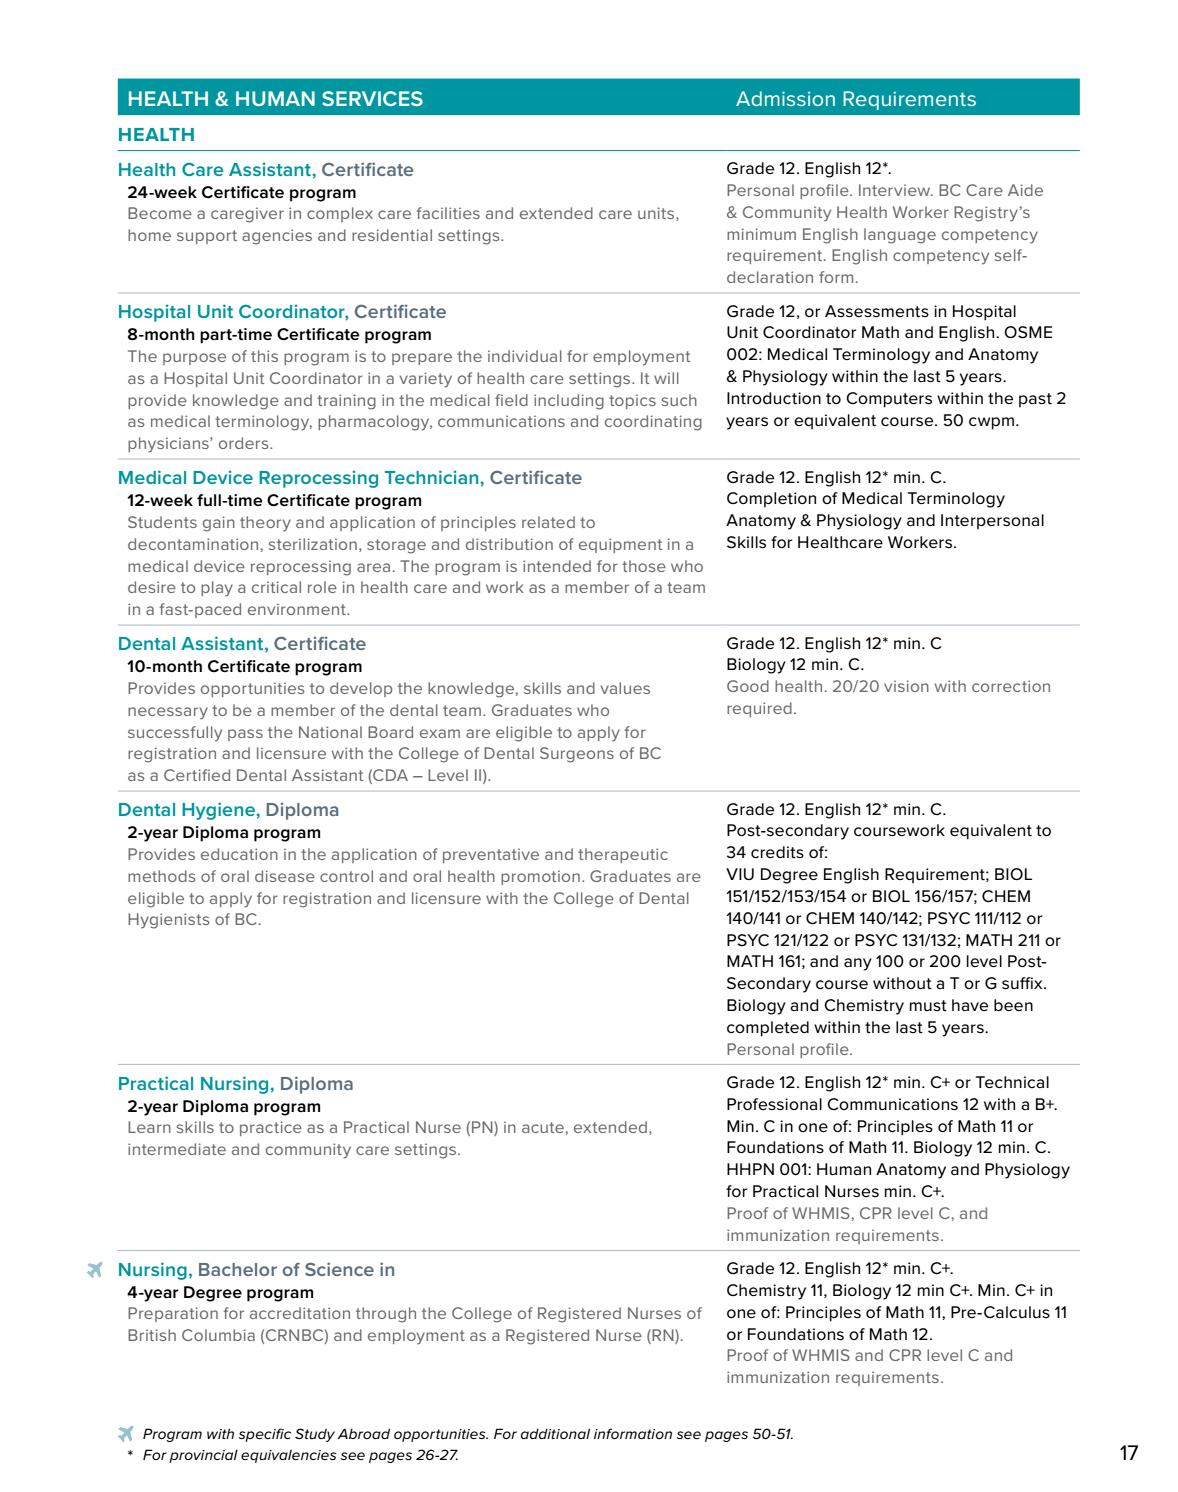 VIU viewbook 2016 by Vancouver Island University - issuu